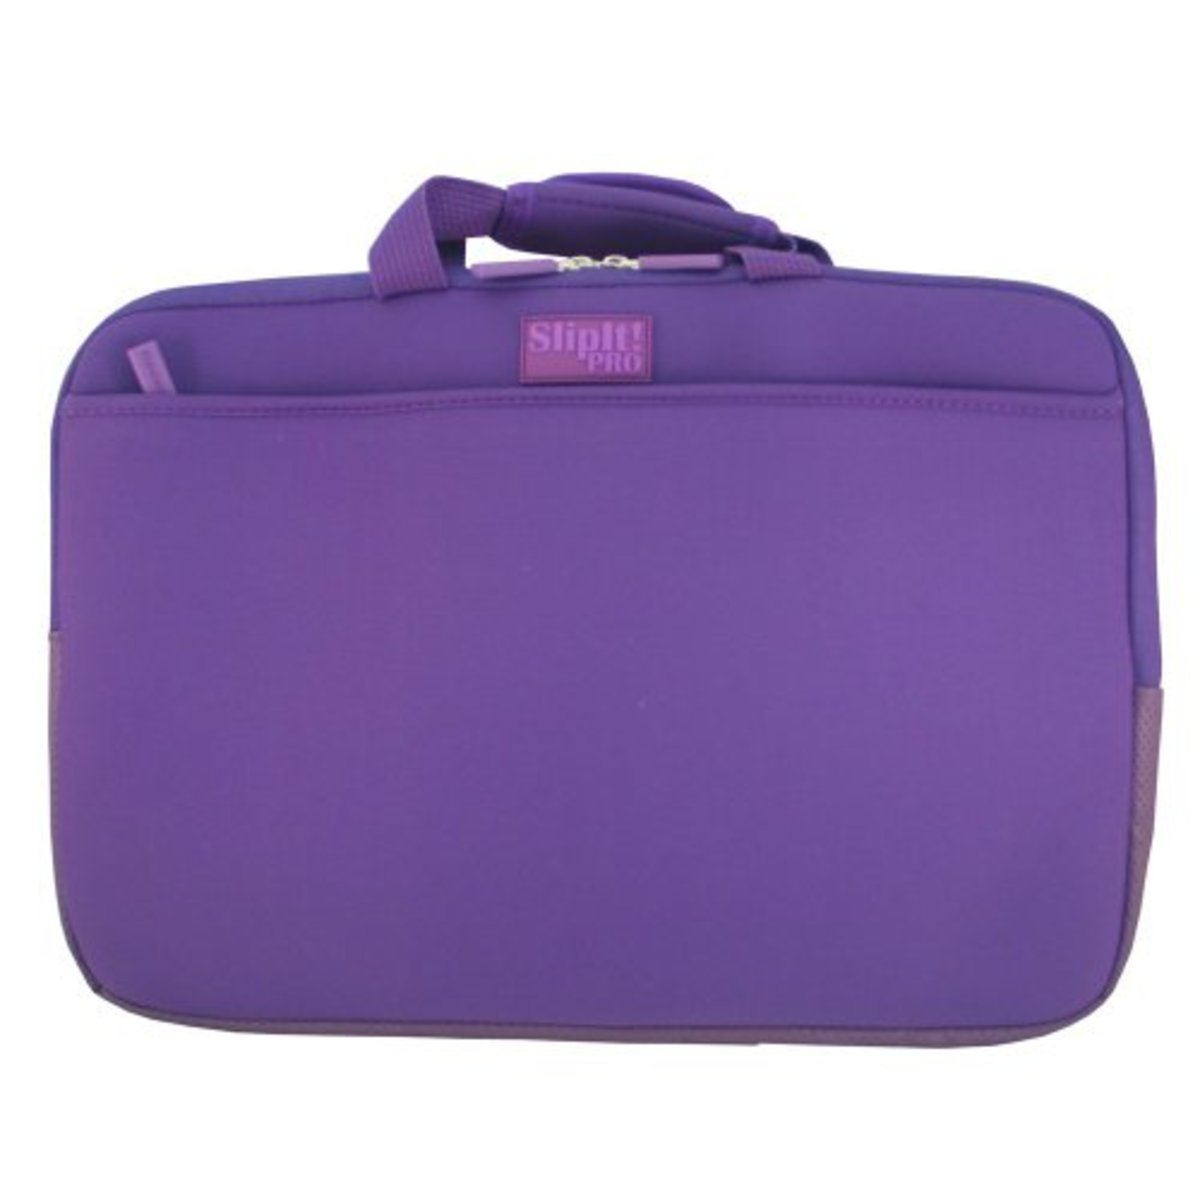 PC Treasures SlipIt! Pro 17-Inch Neoprene Case with Zippered Pockets - Purple